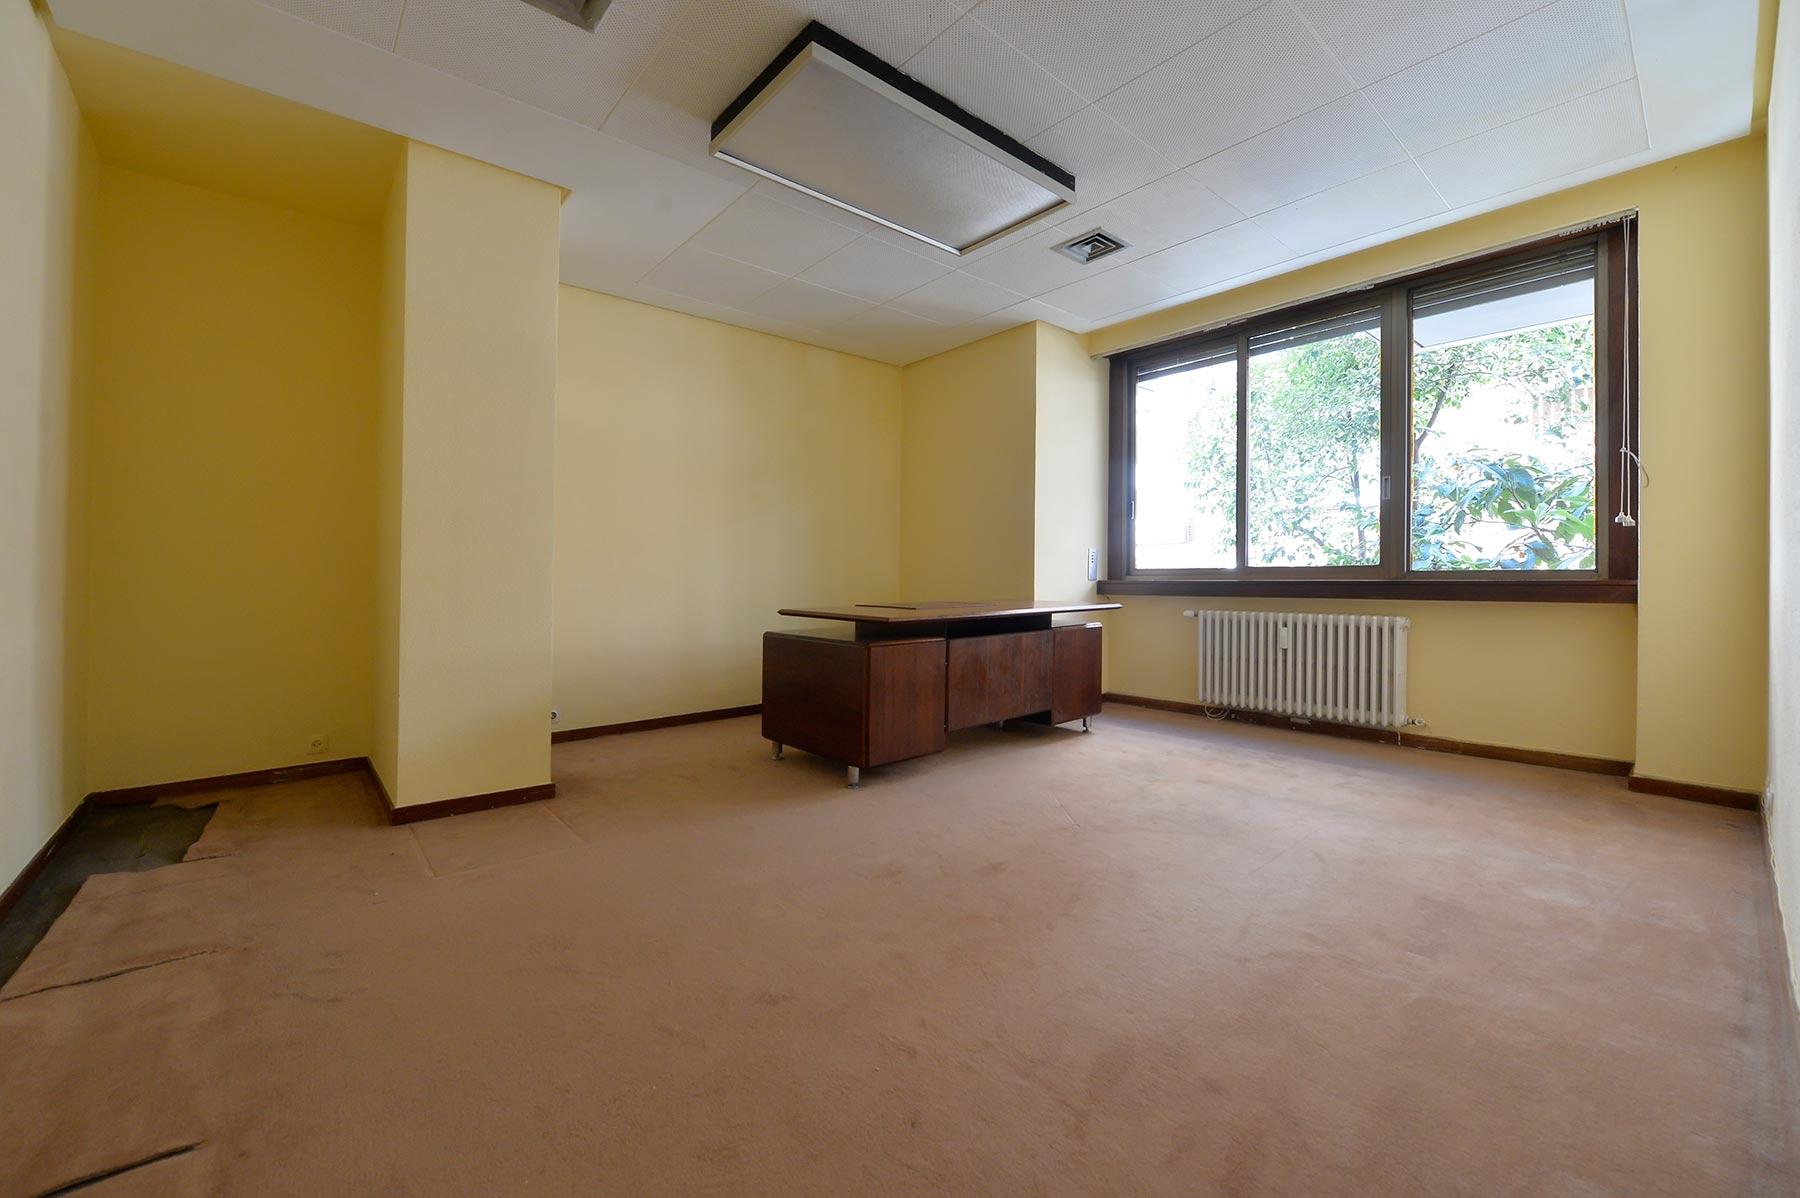 Villa per Vendita alle ore Excellent apartment with two parking spaces Nuñez de Balboa Madrid, Madrid, 28001 Spagna